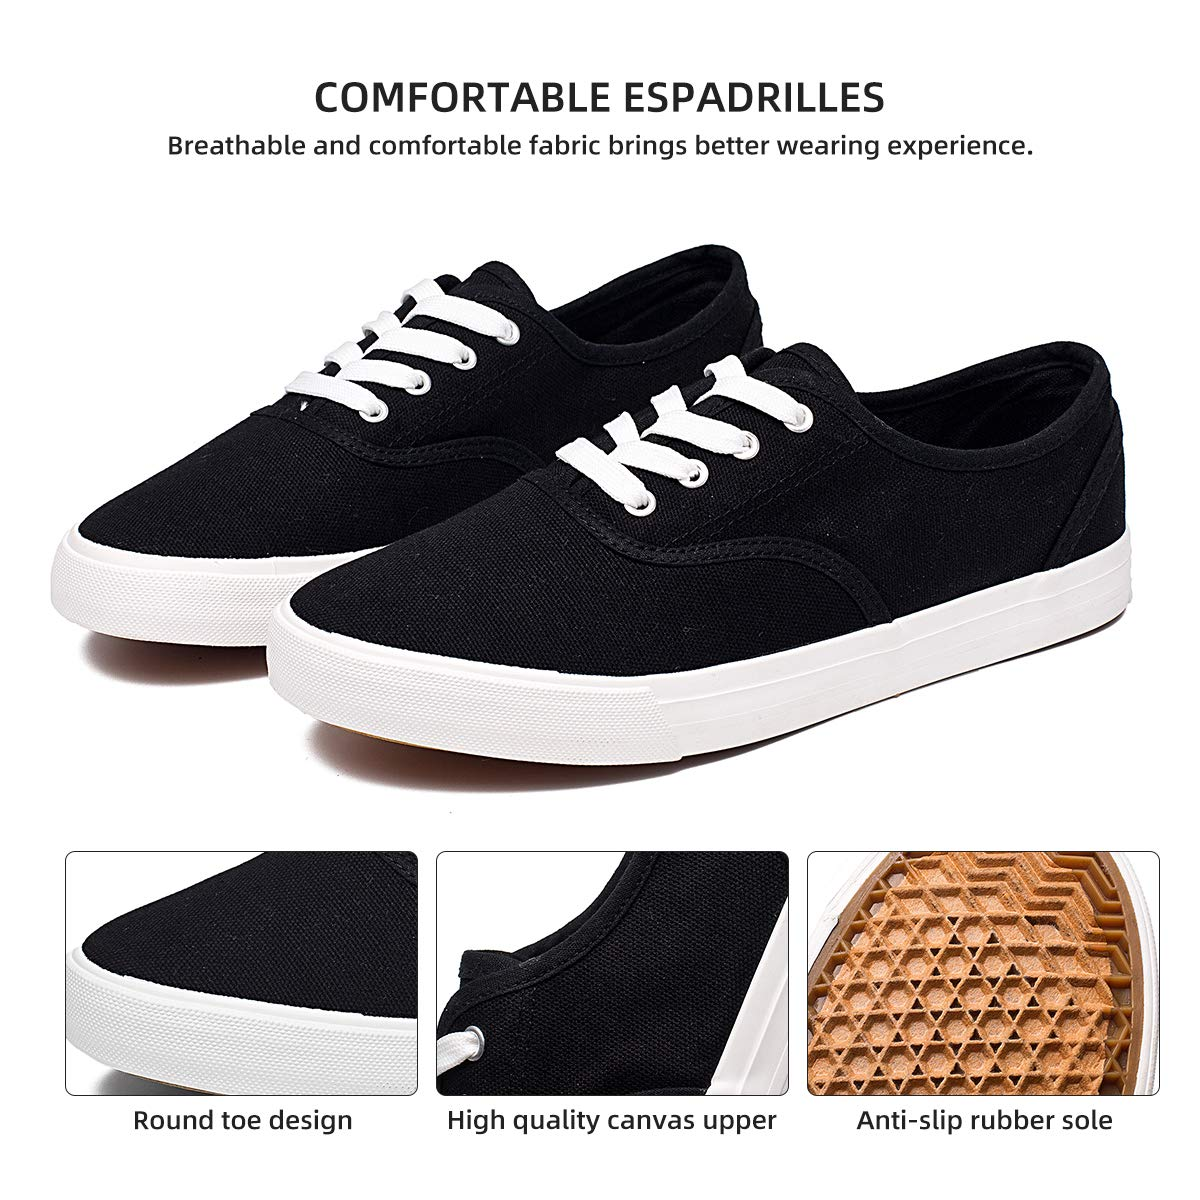 ZGR Women's Canvas Shoes Fashion Low Cut Loafer Sneakers (us7, Black)